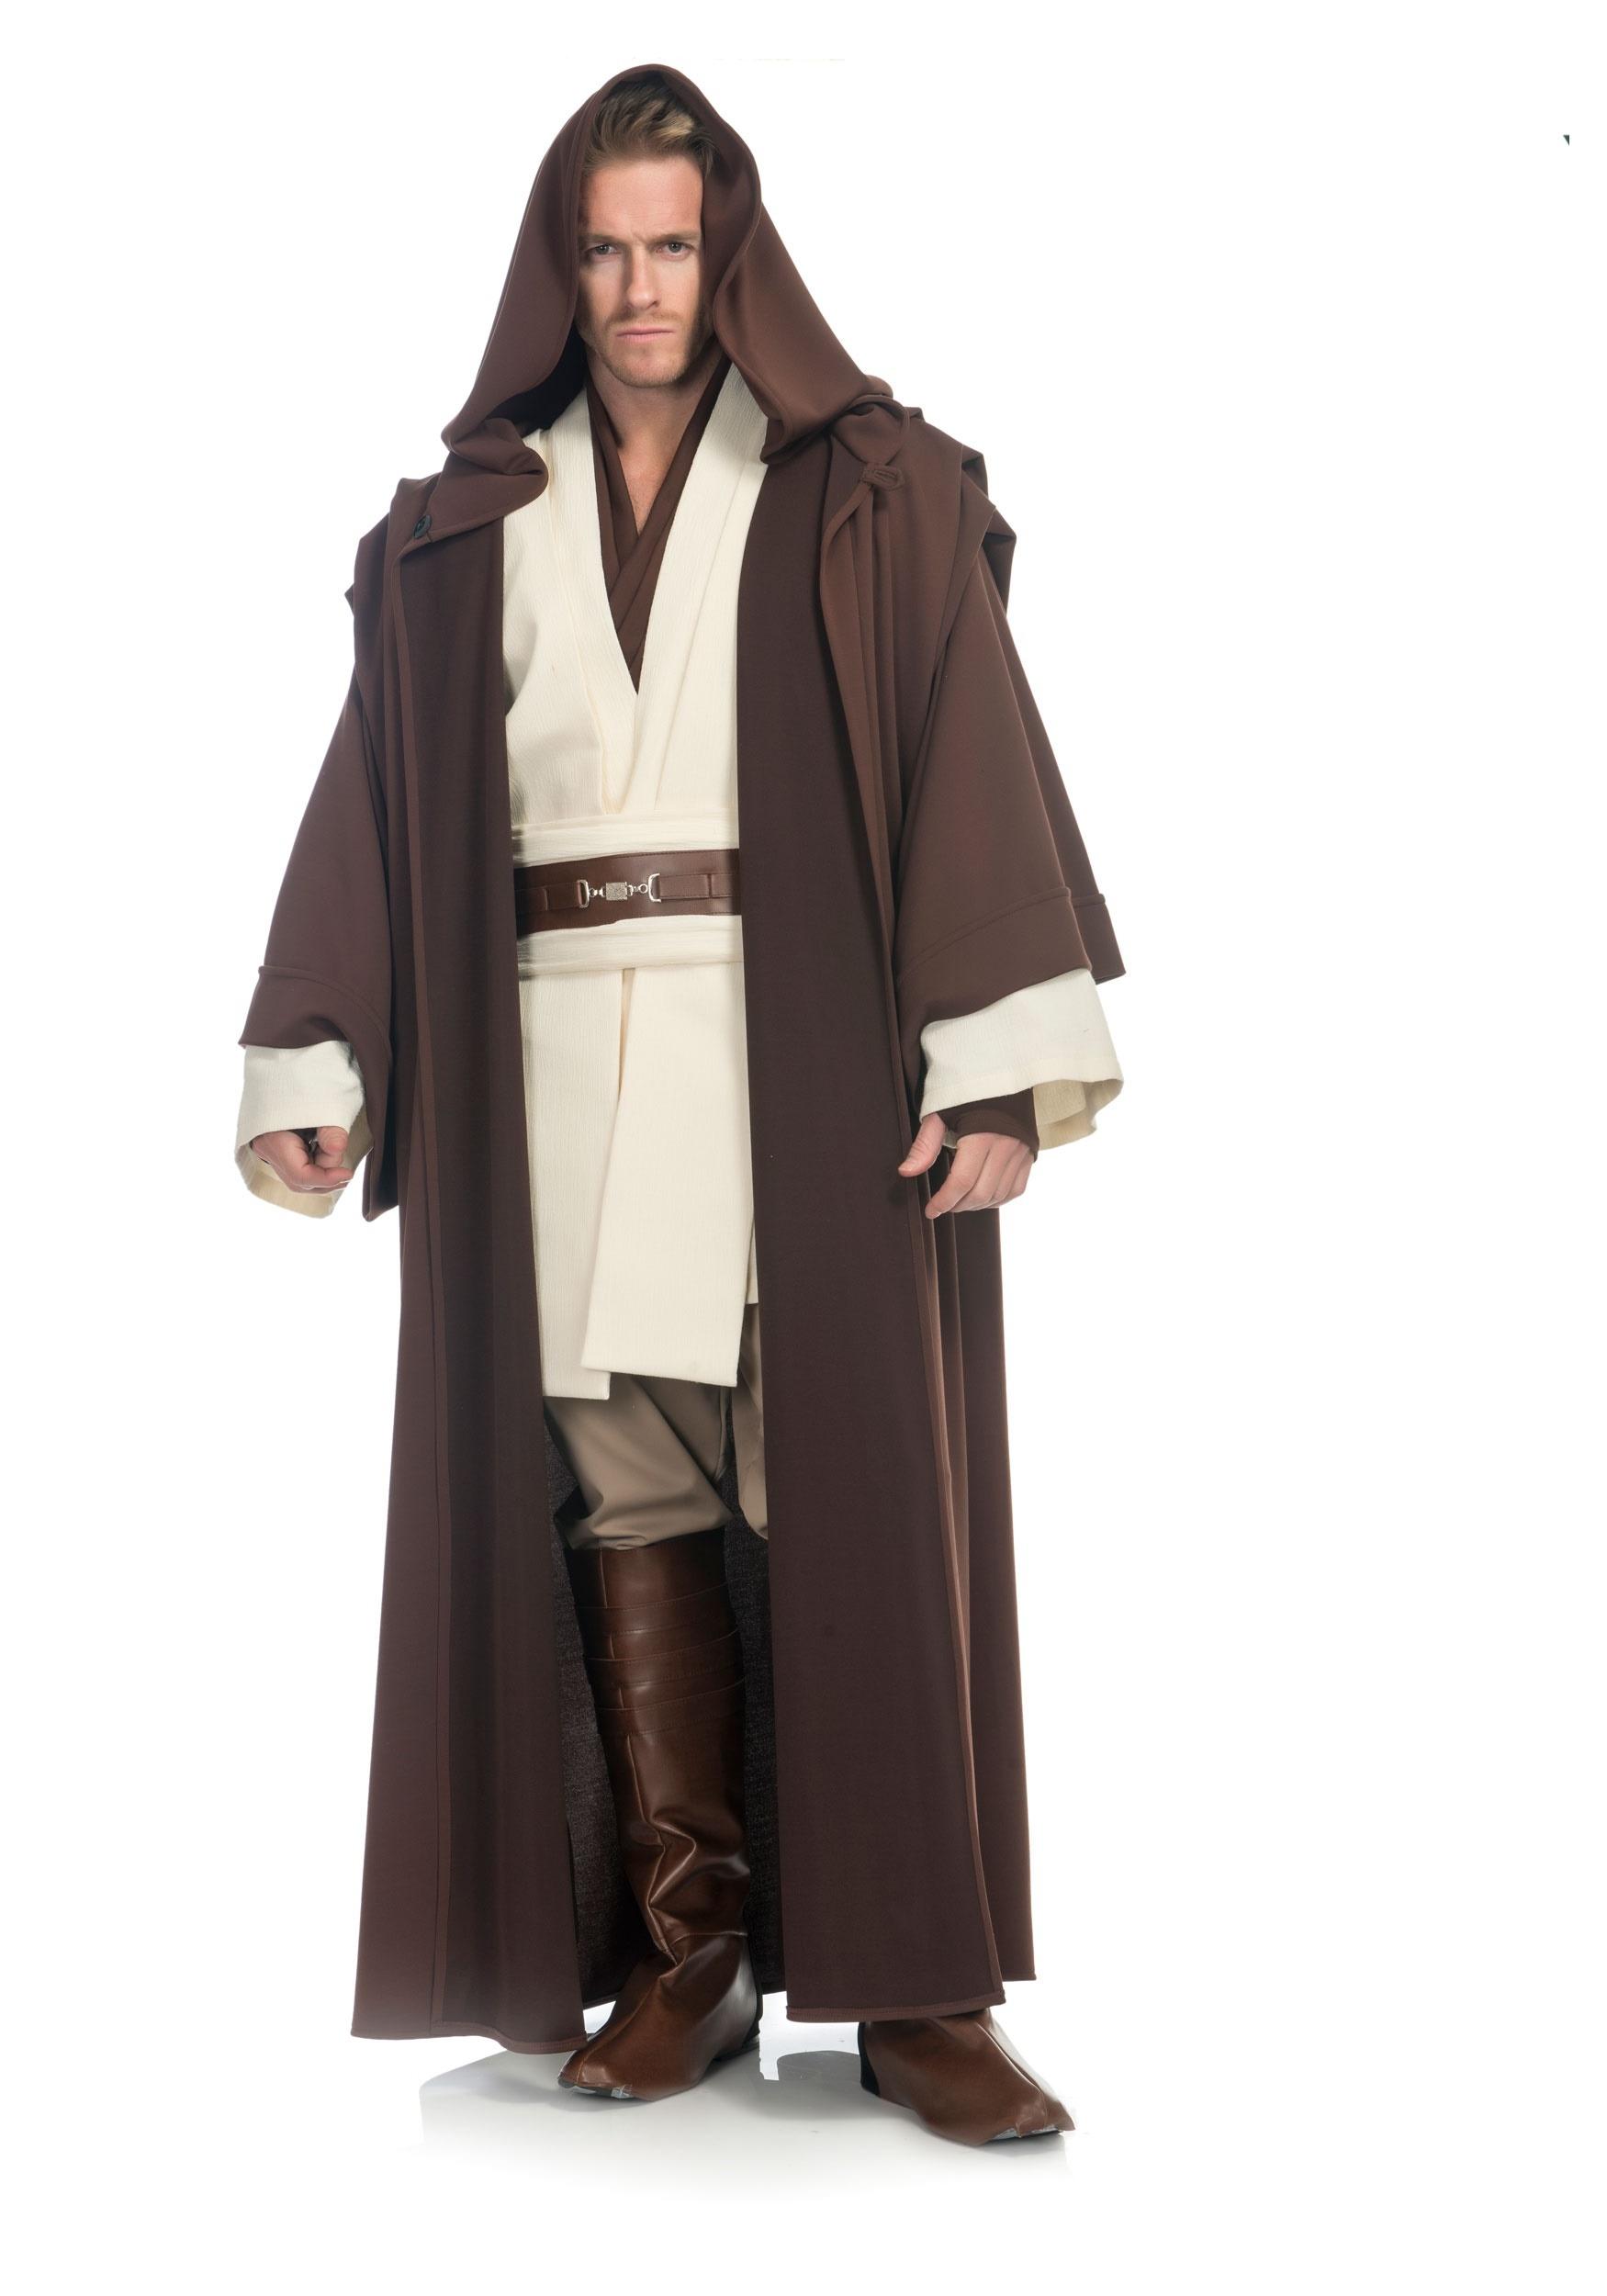 obi wan kenobi mens costume from star wars